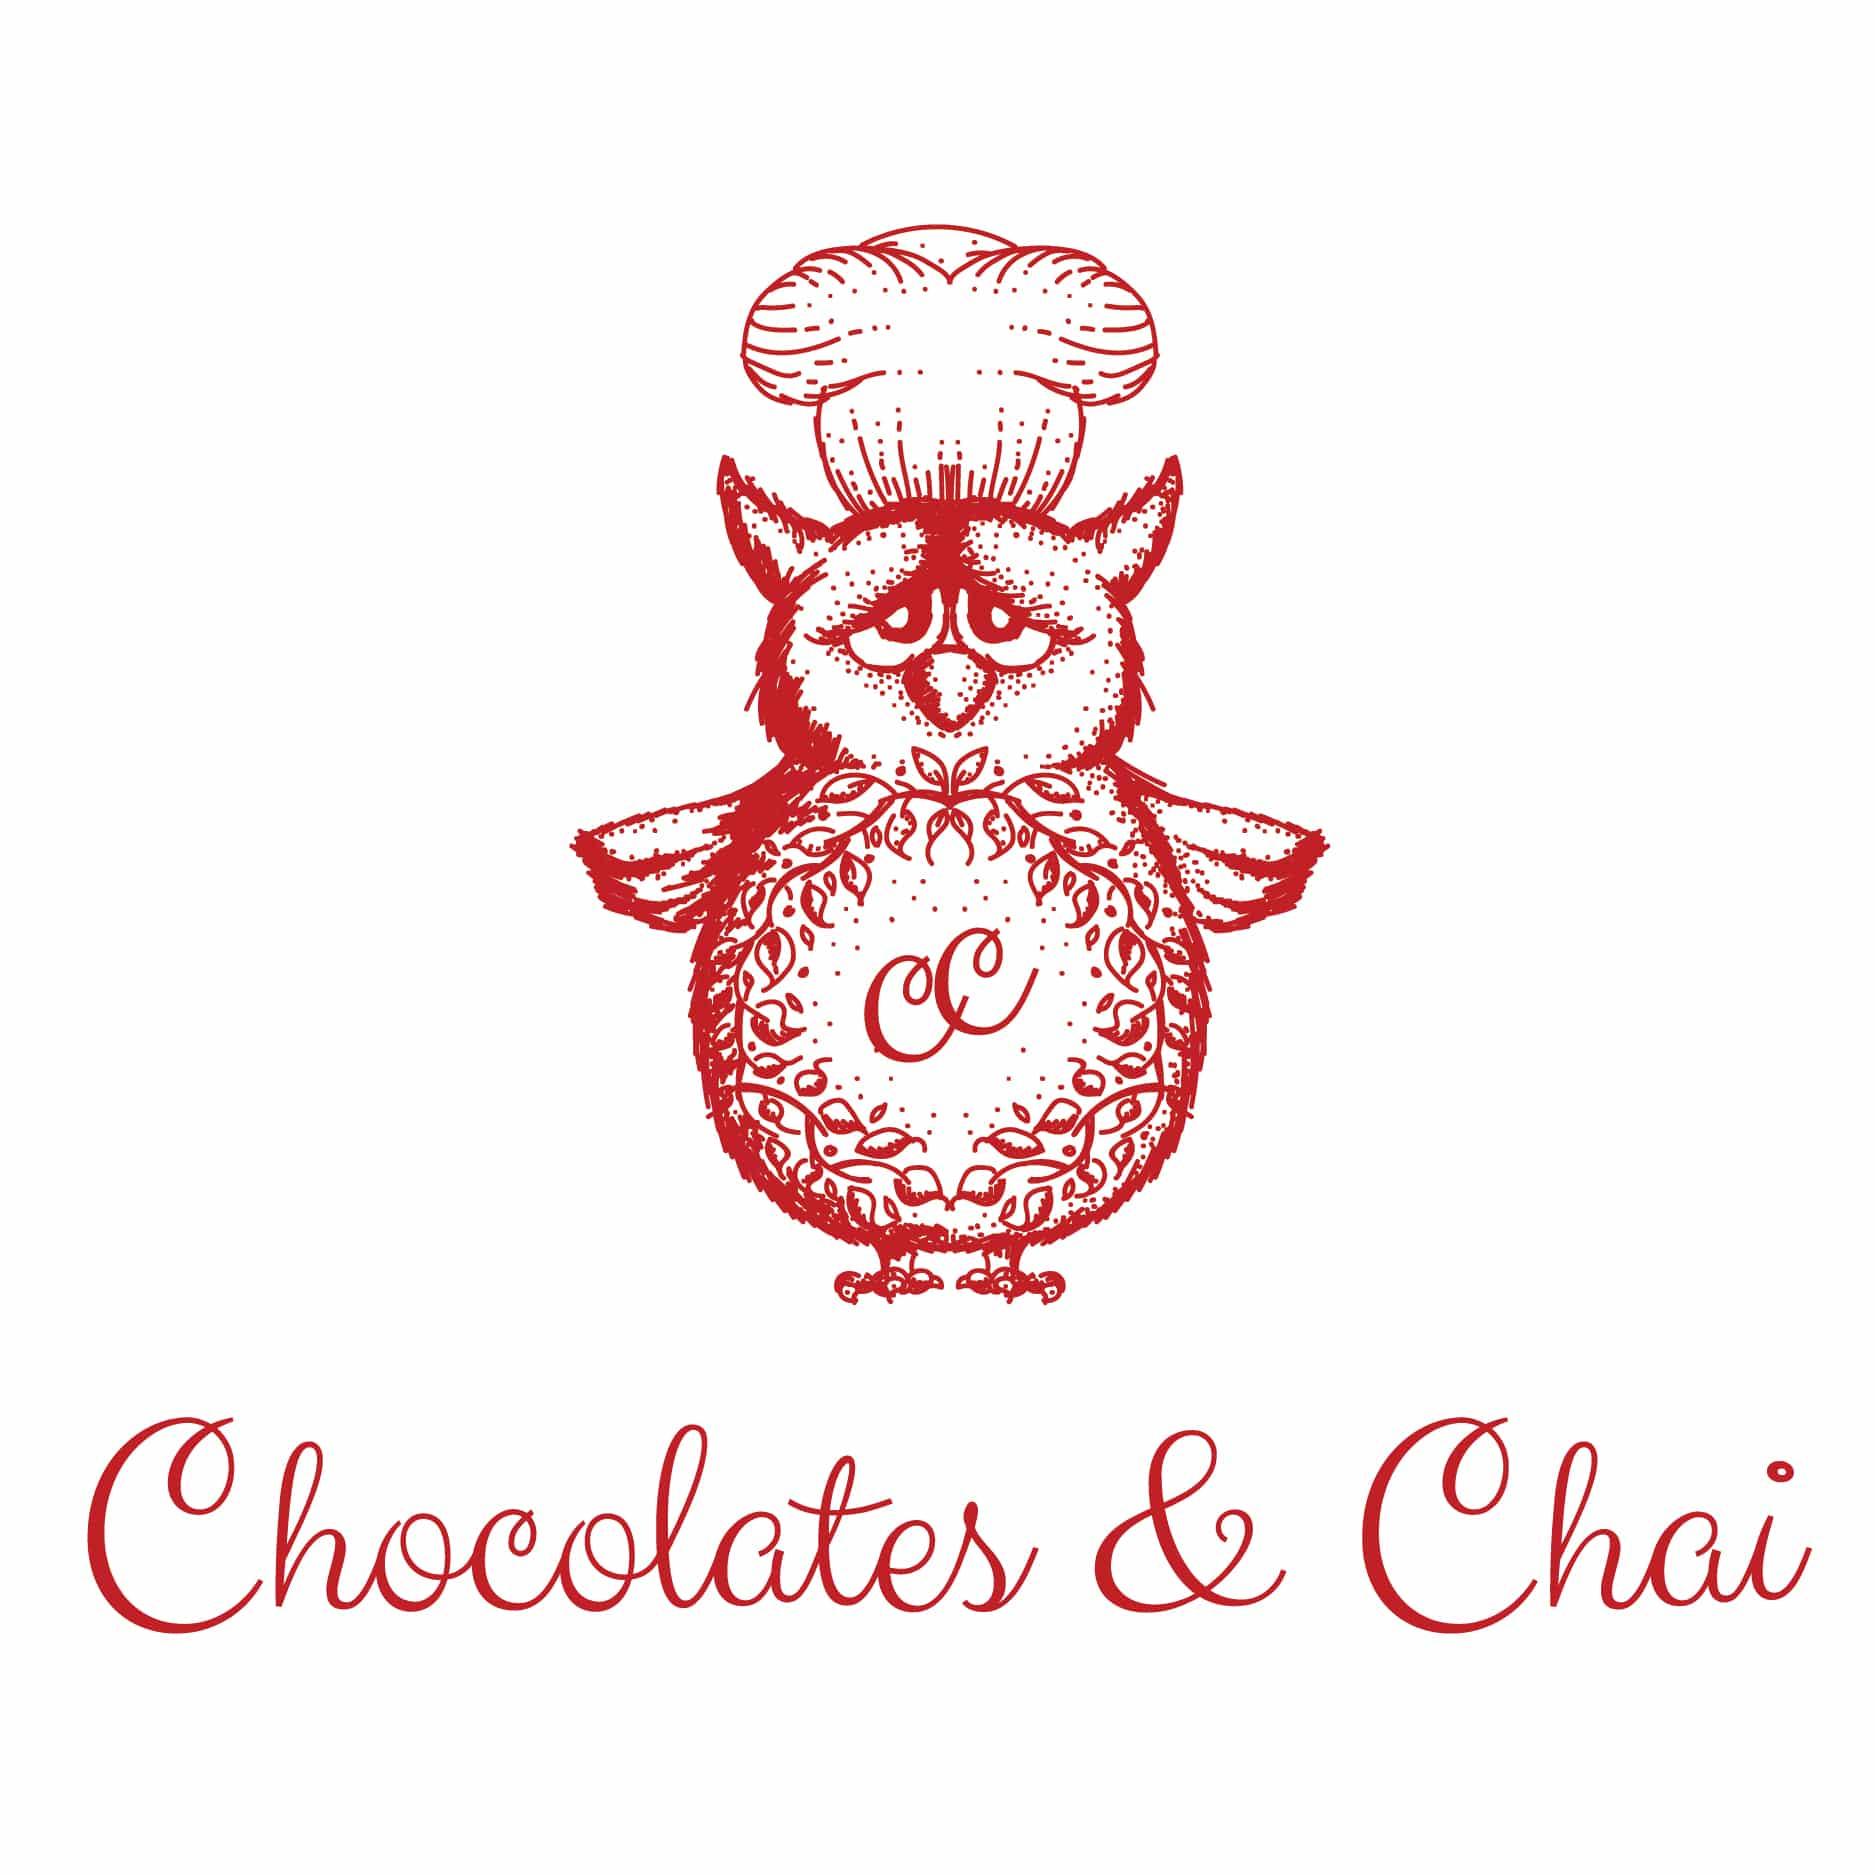 Chocolates & Chai - Good food, good company, great recipes.